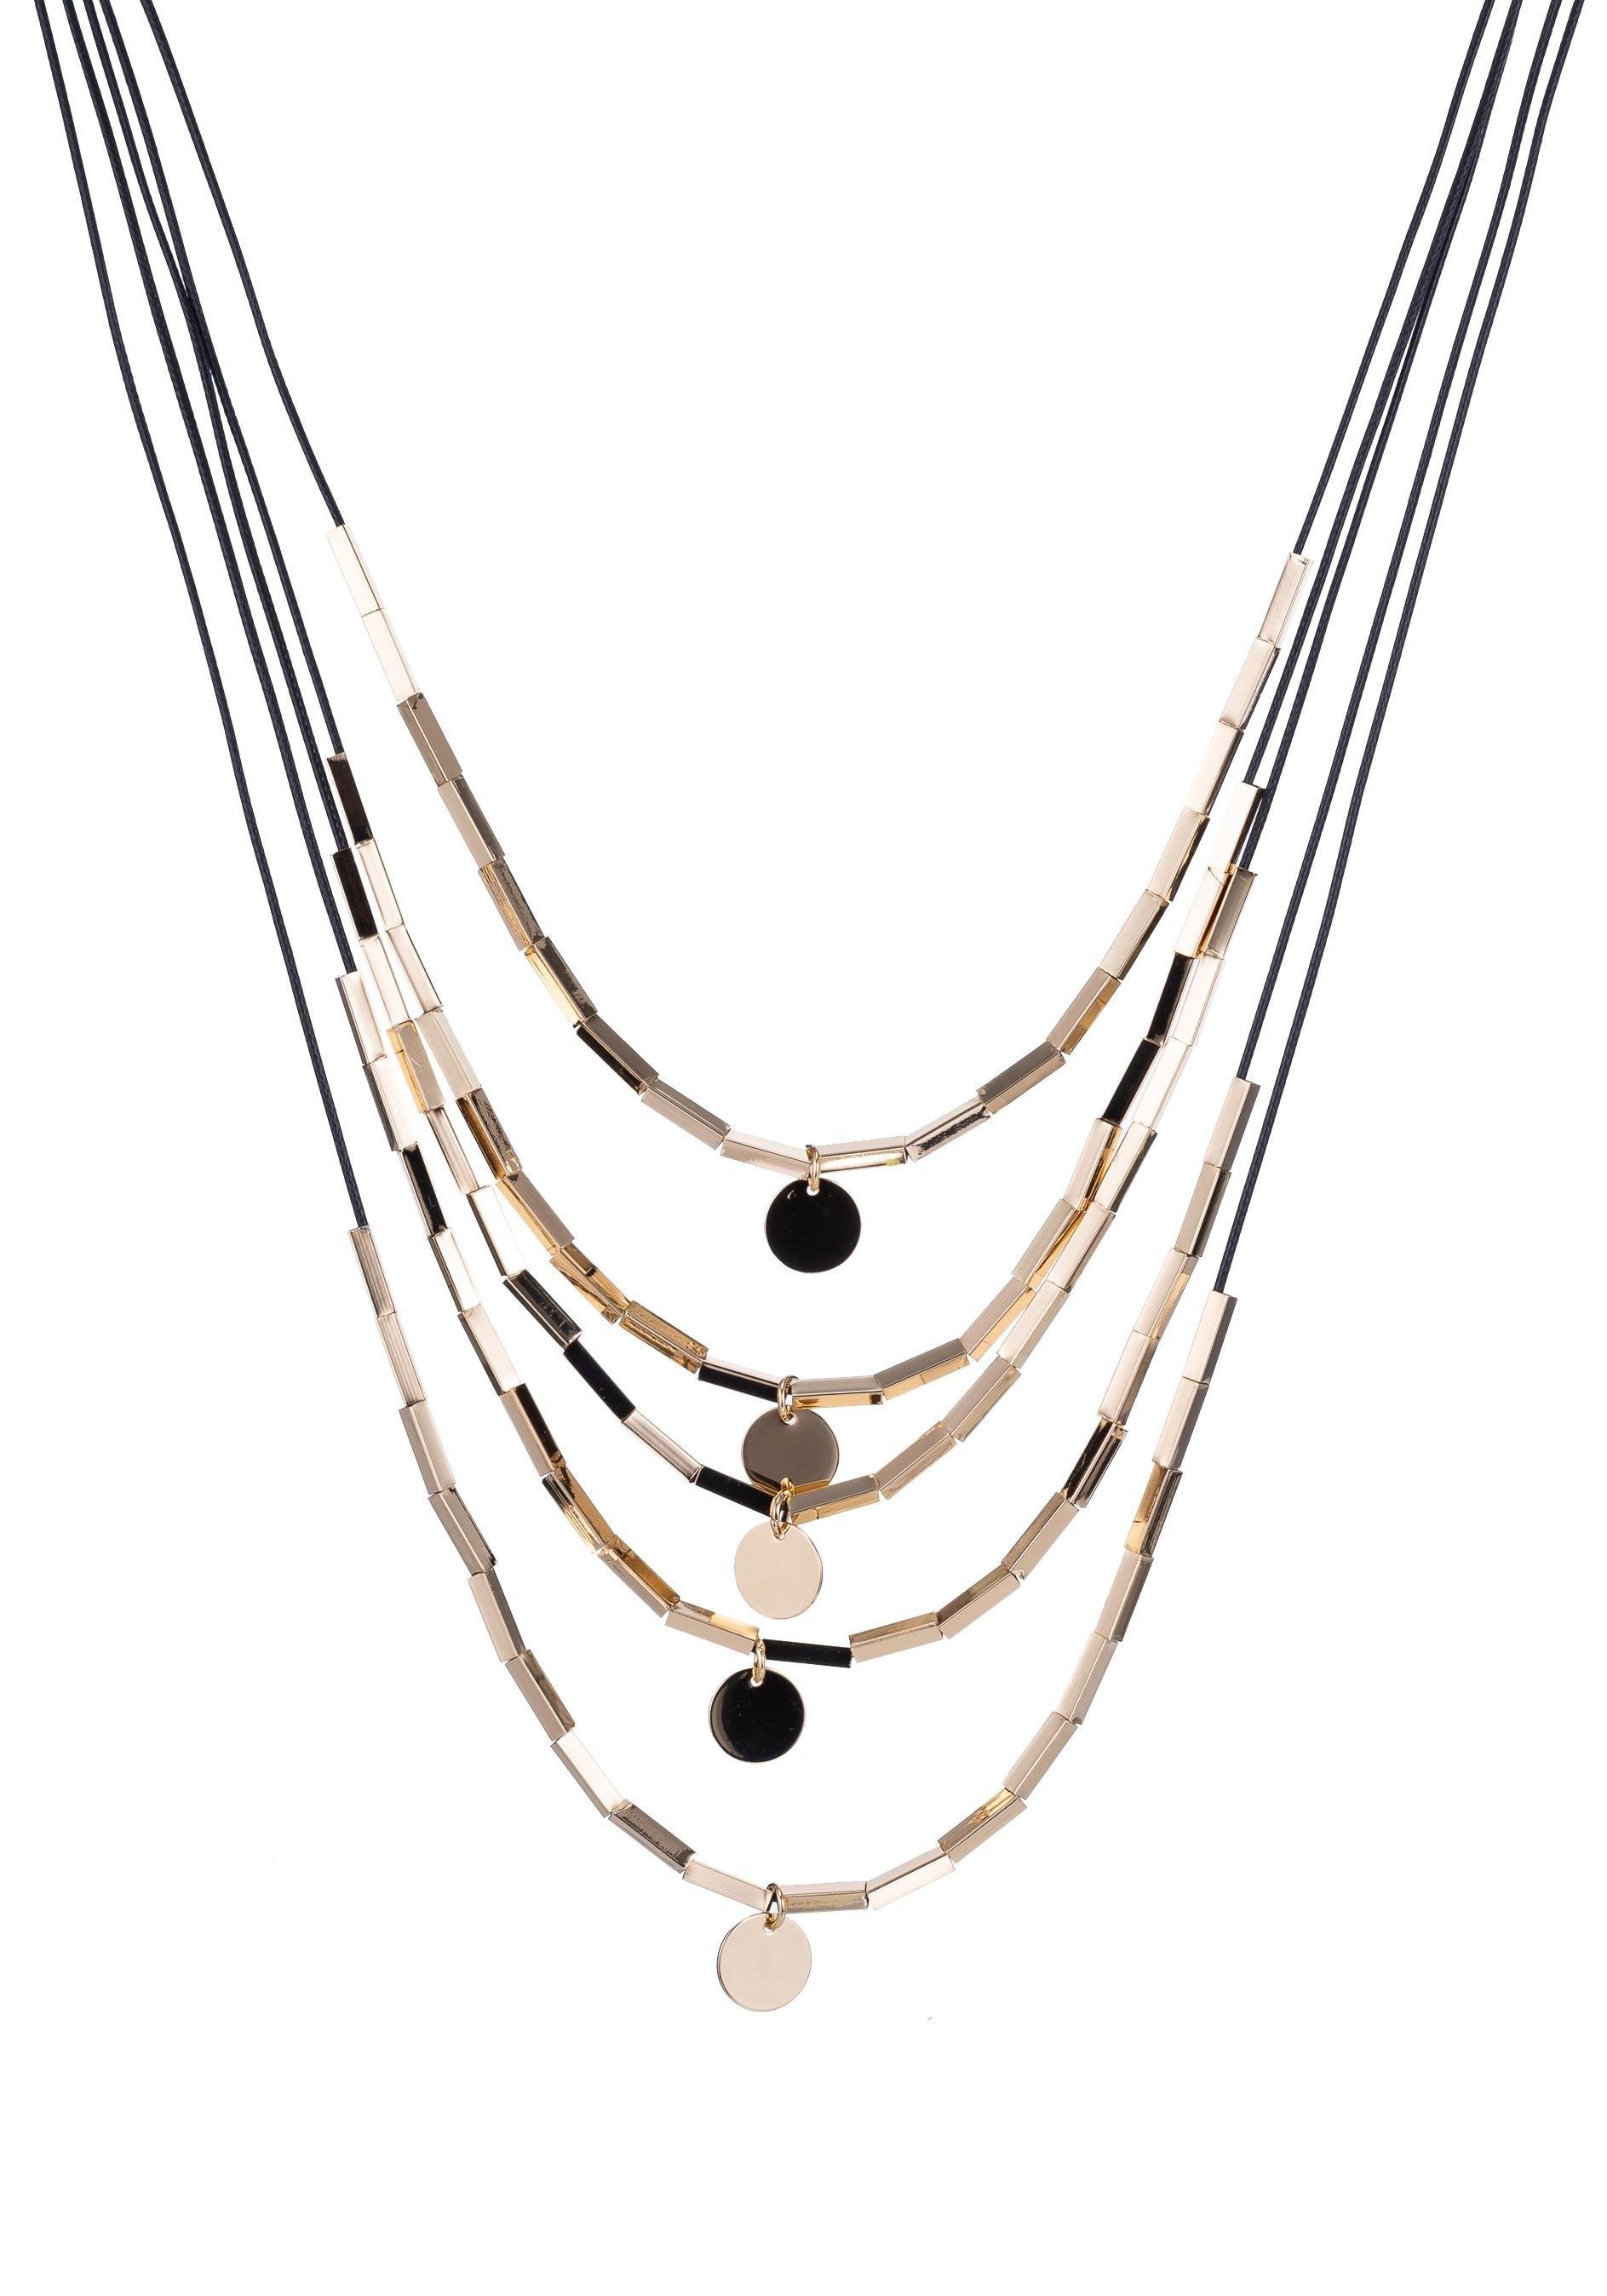 J JAYZ J.Jayz ketting met hanger »In waterval-look« nu online bestellen